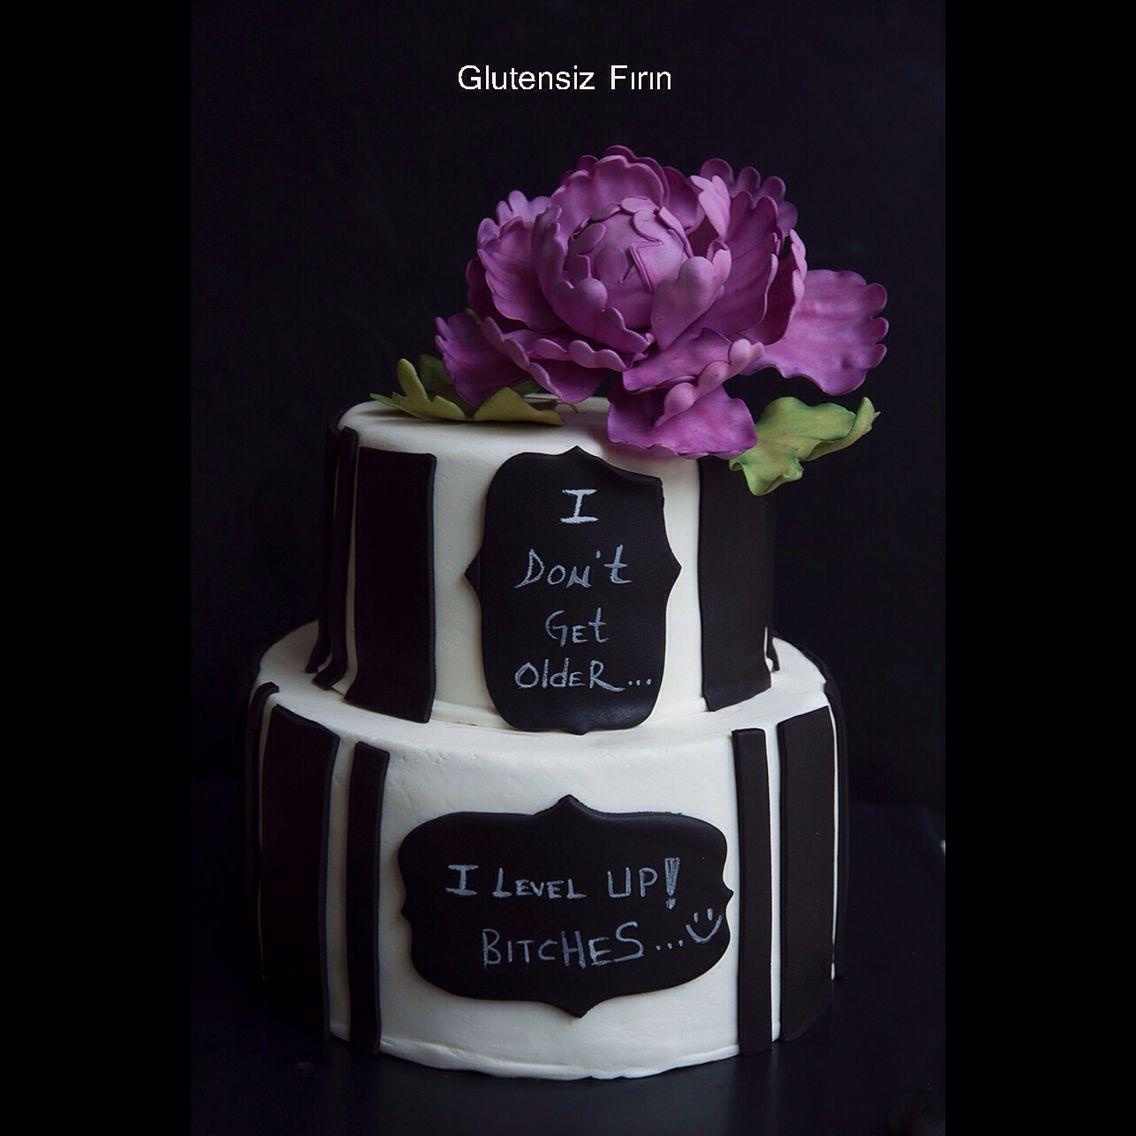 Glutenfree peony cake